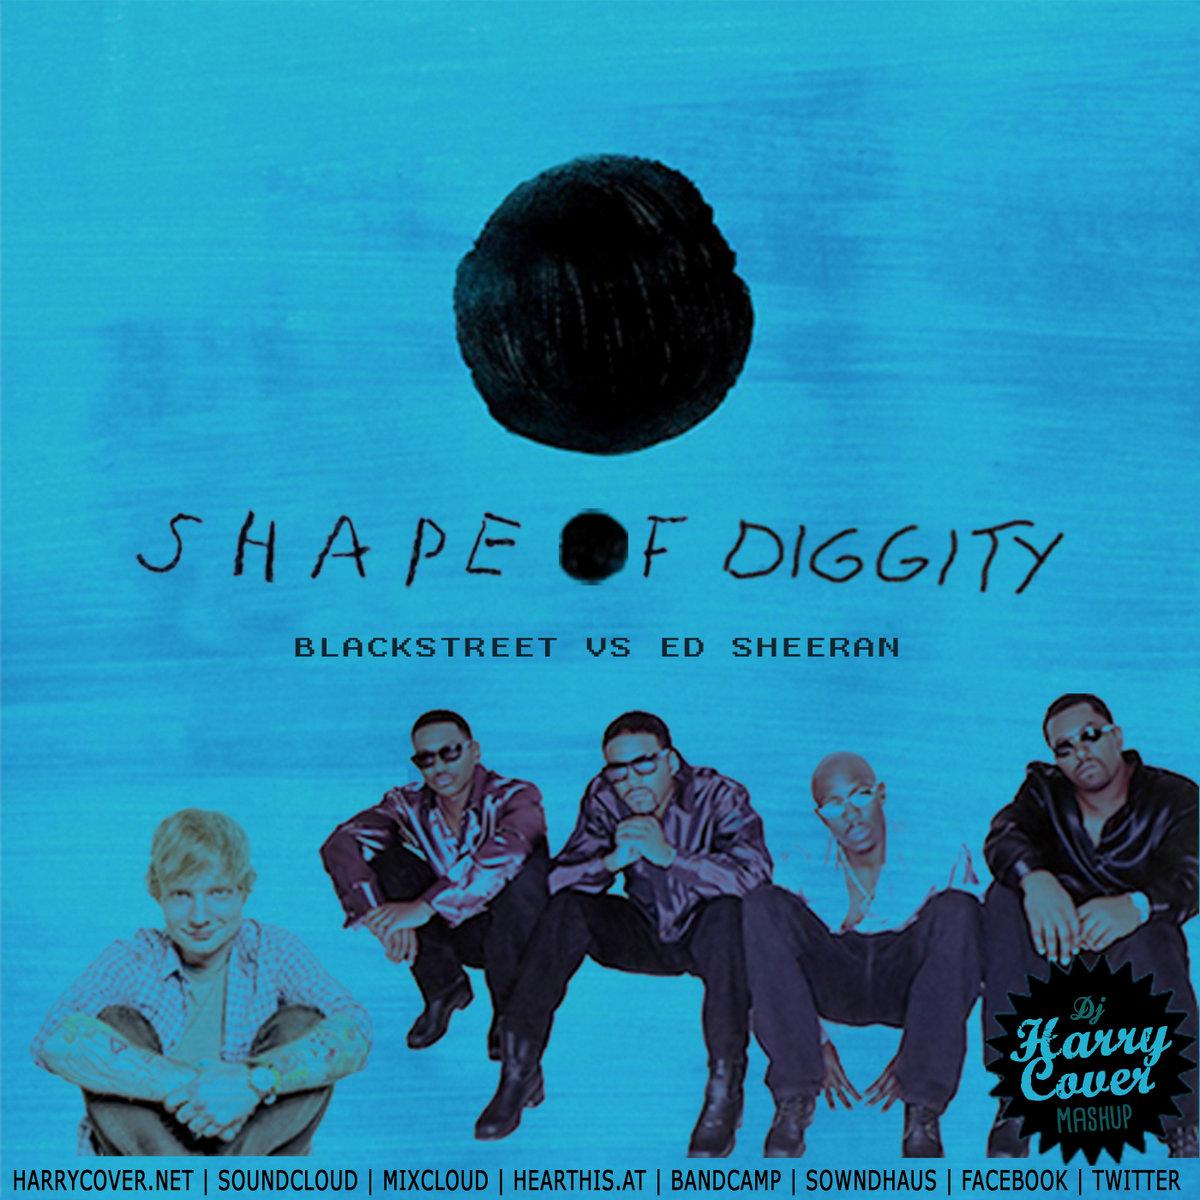 Blackstreet Vs Ed Sheeran - Shape Of Diggity (Dj Harry Cover Mashup